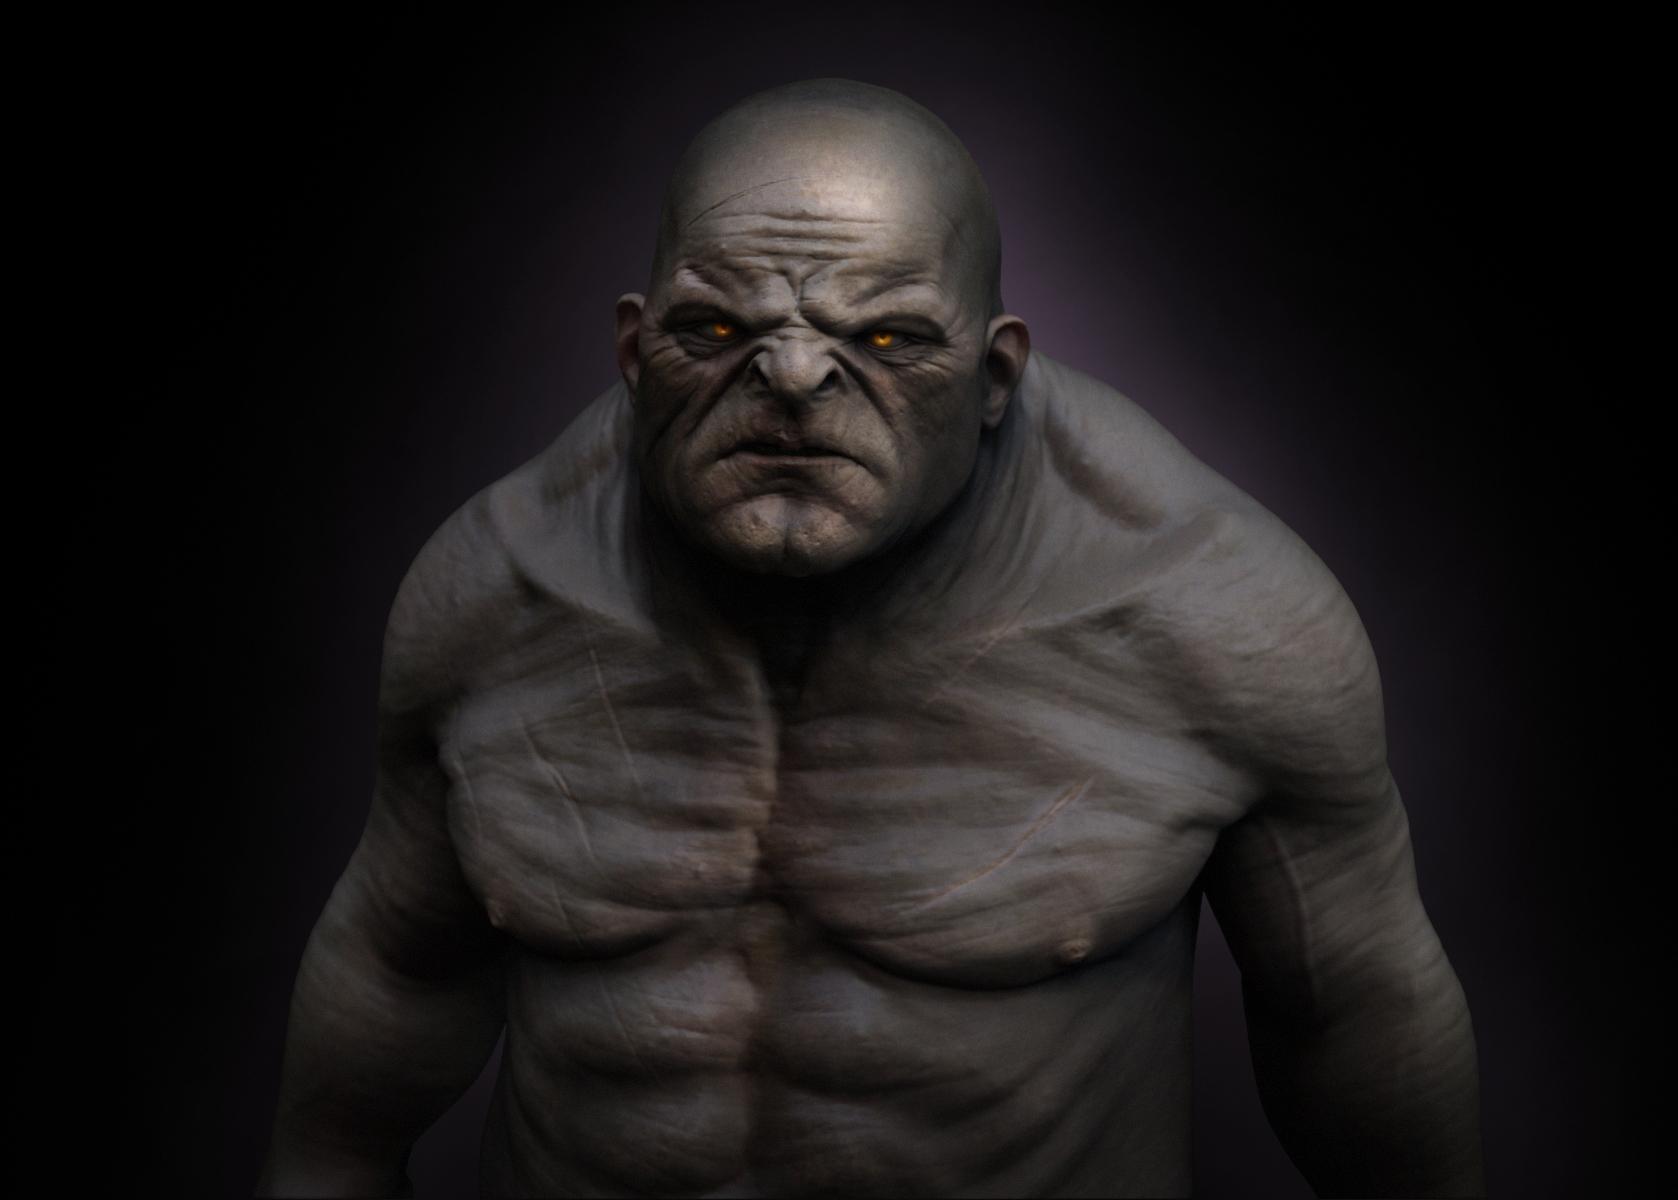 Ogre Man